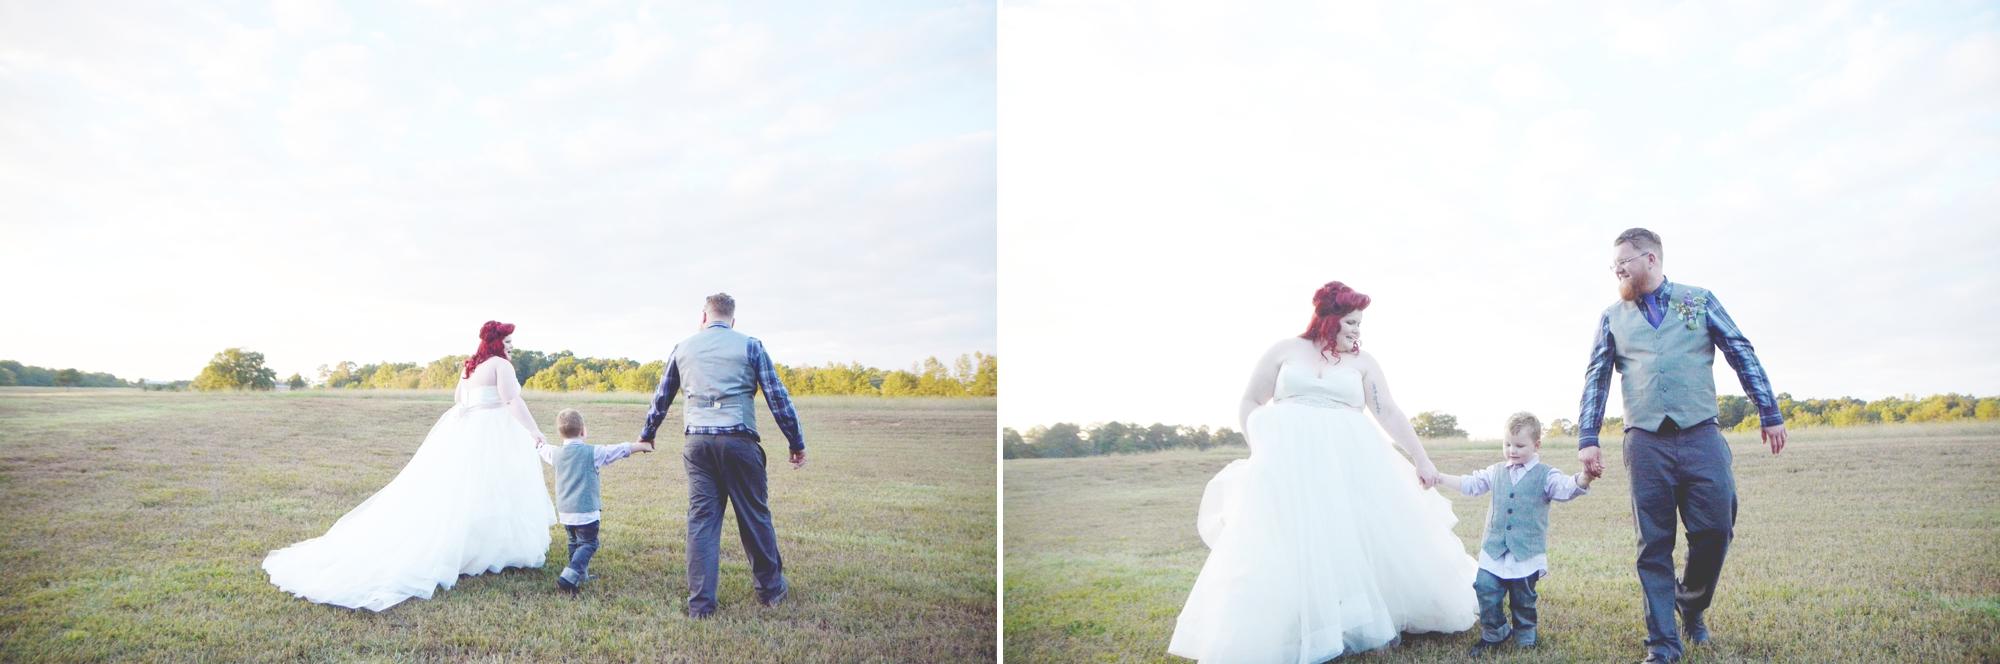 the-red-tin-barn-wedding-six-hearts-photography082